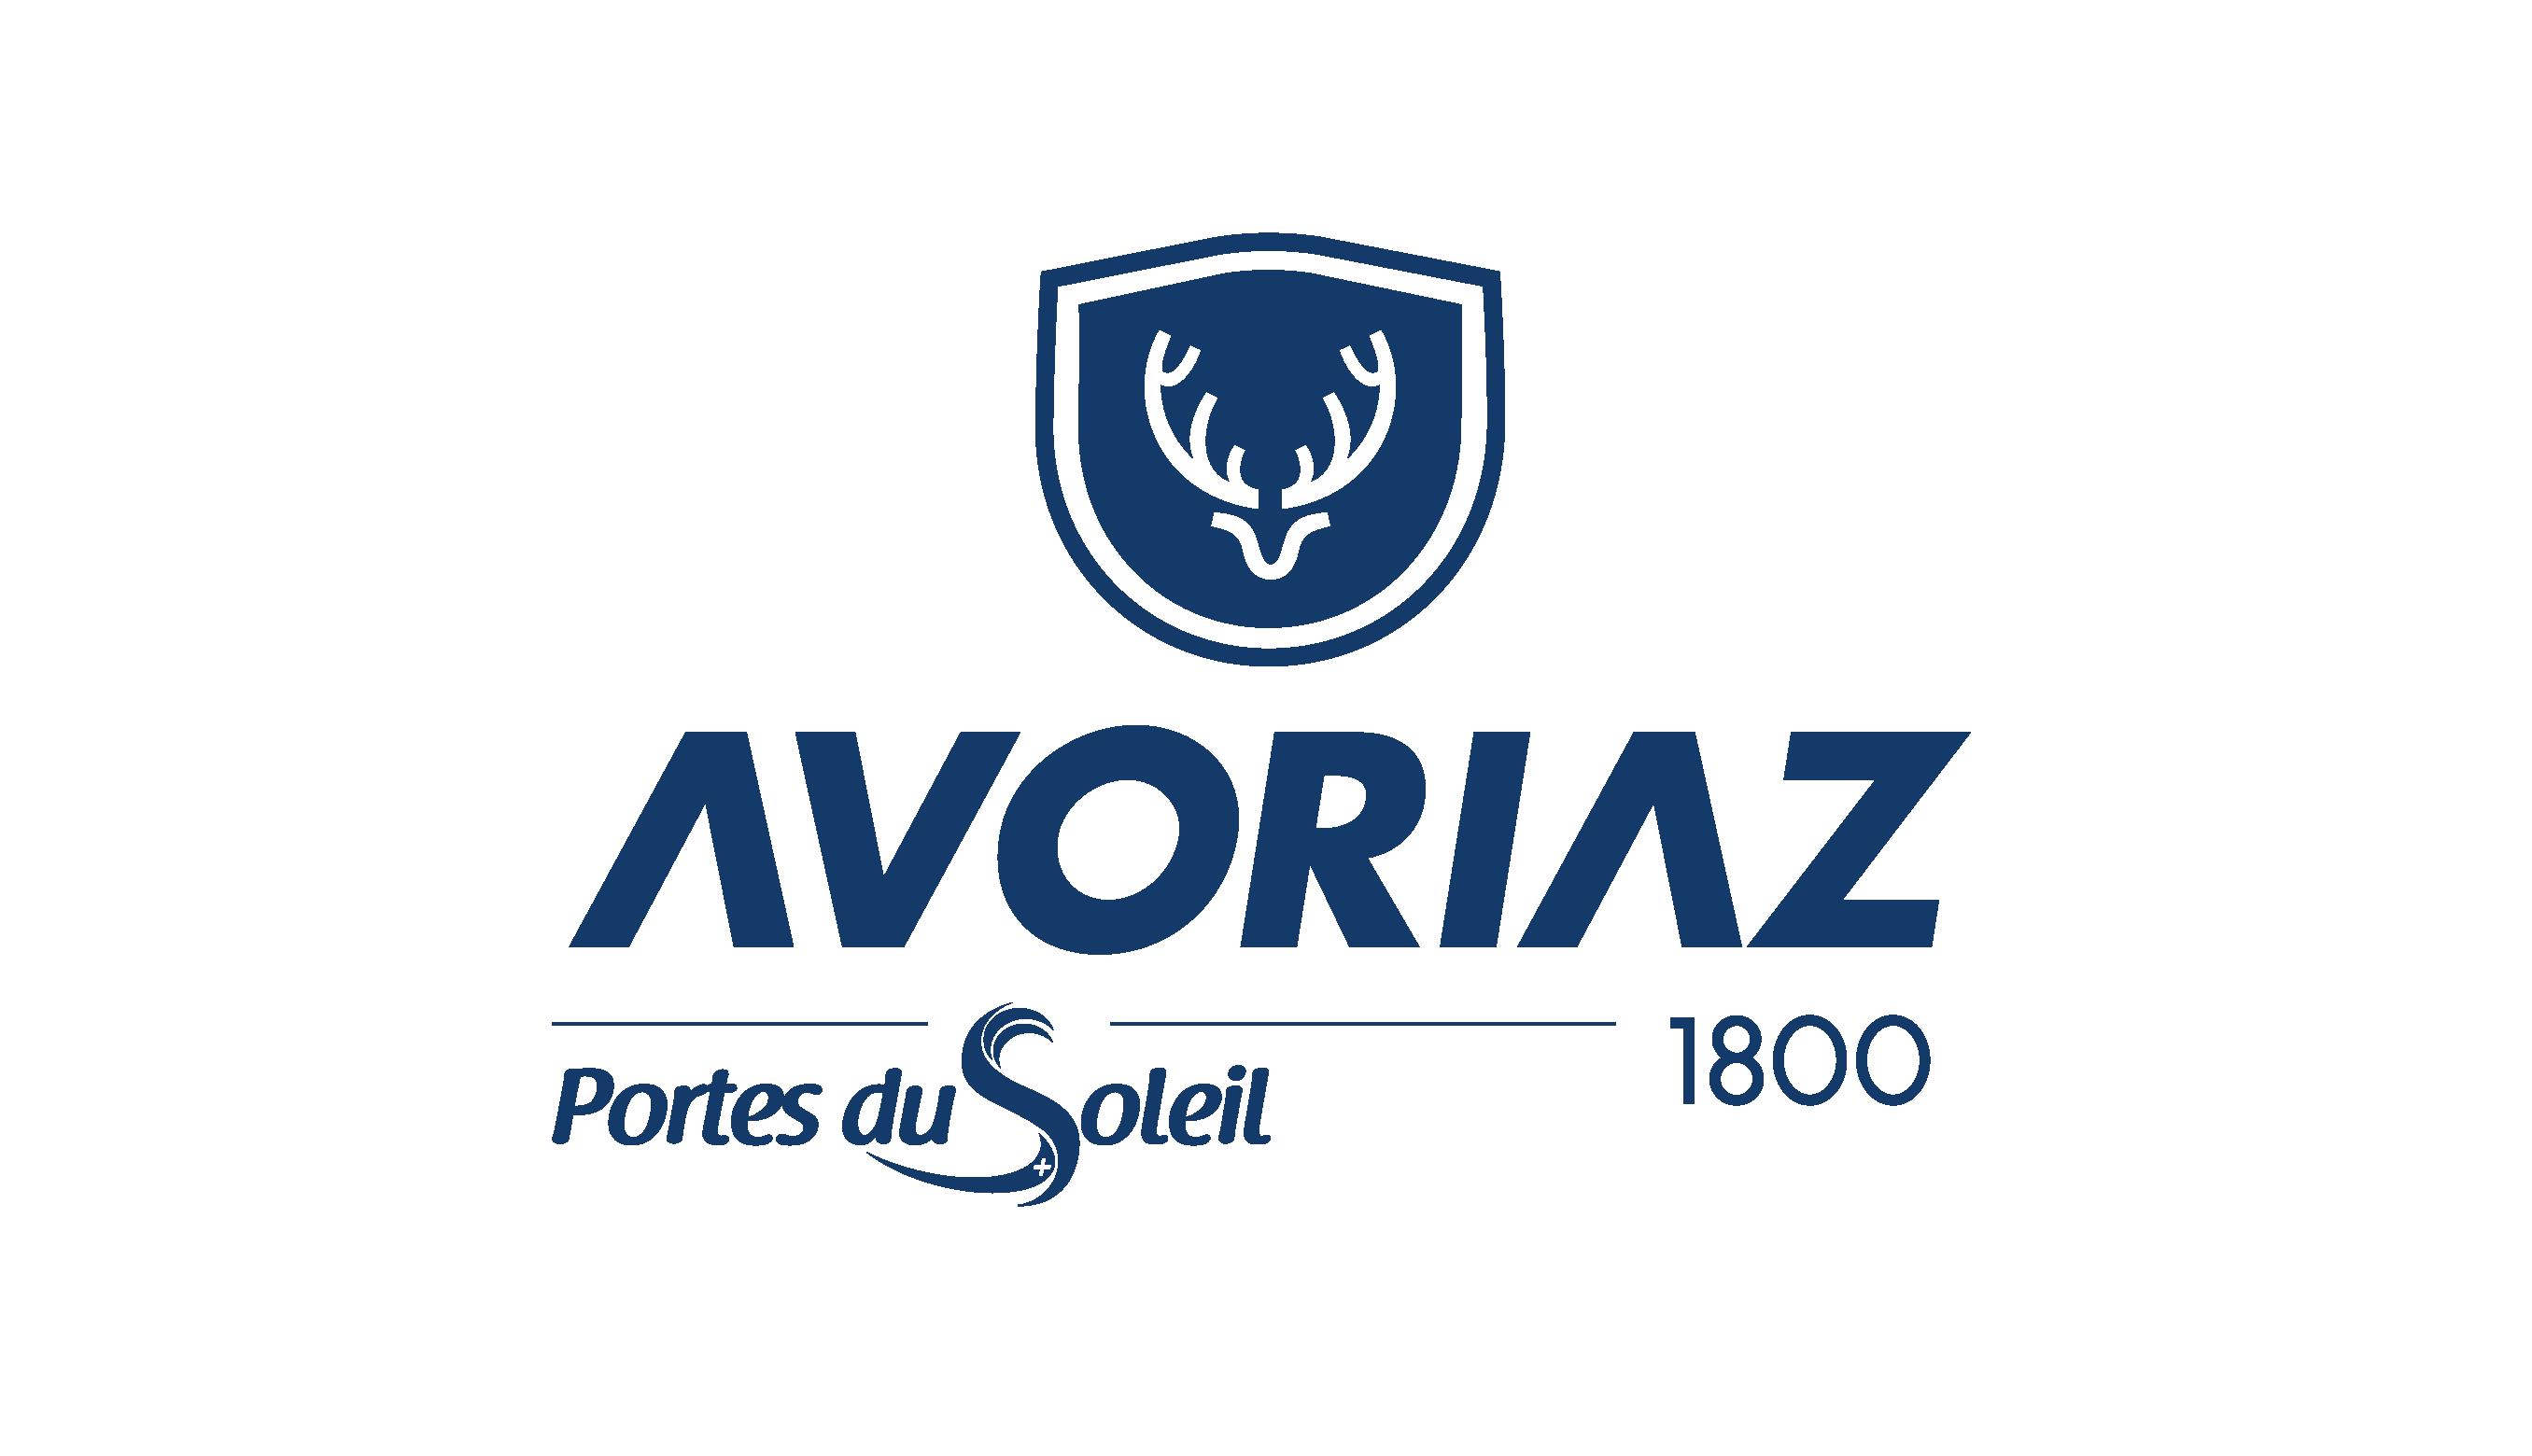 logo de la station de LogosAvoriaz-Full-centre-PortesSol-quadri-2.png